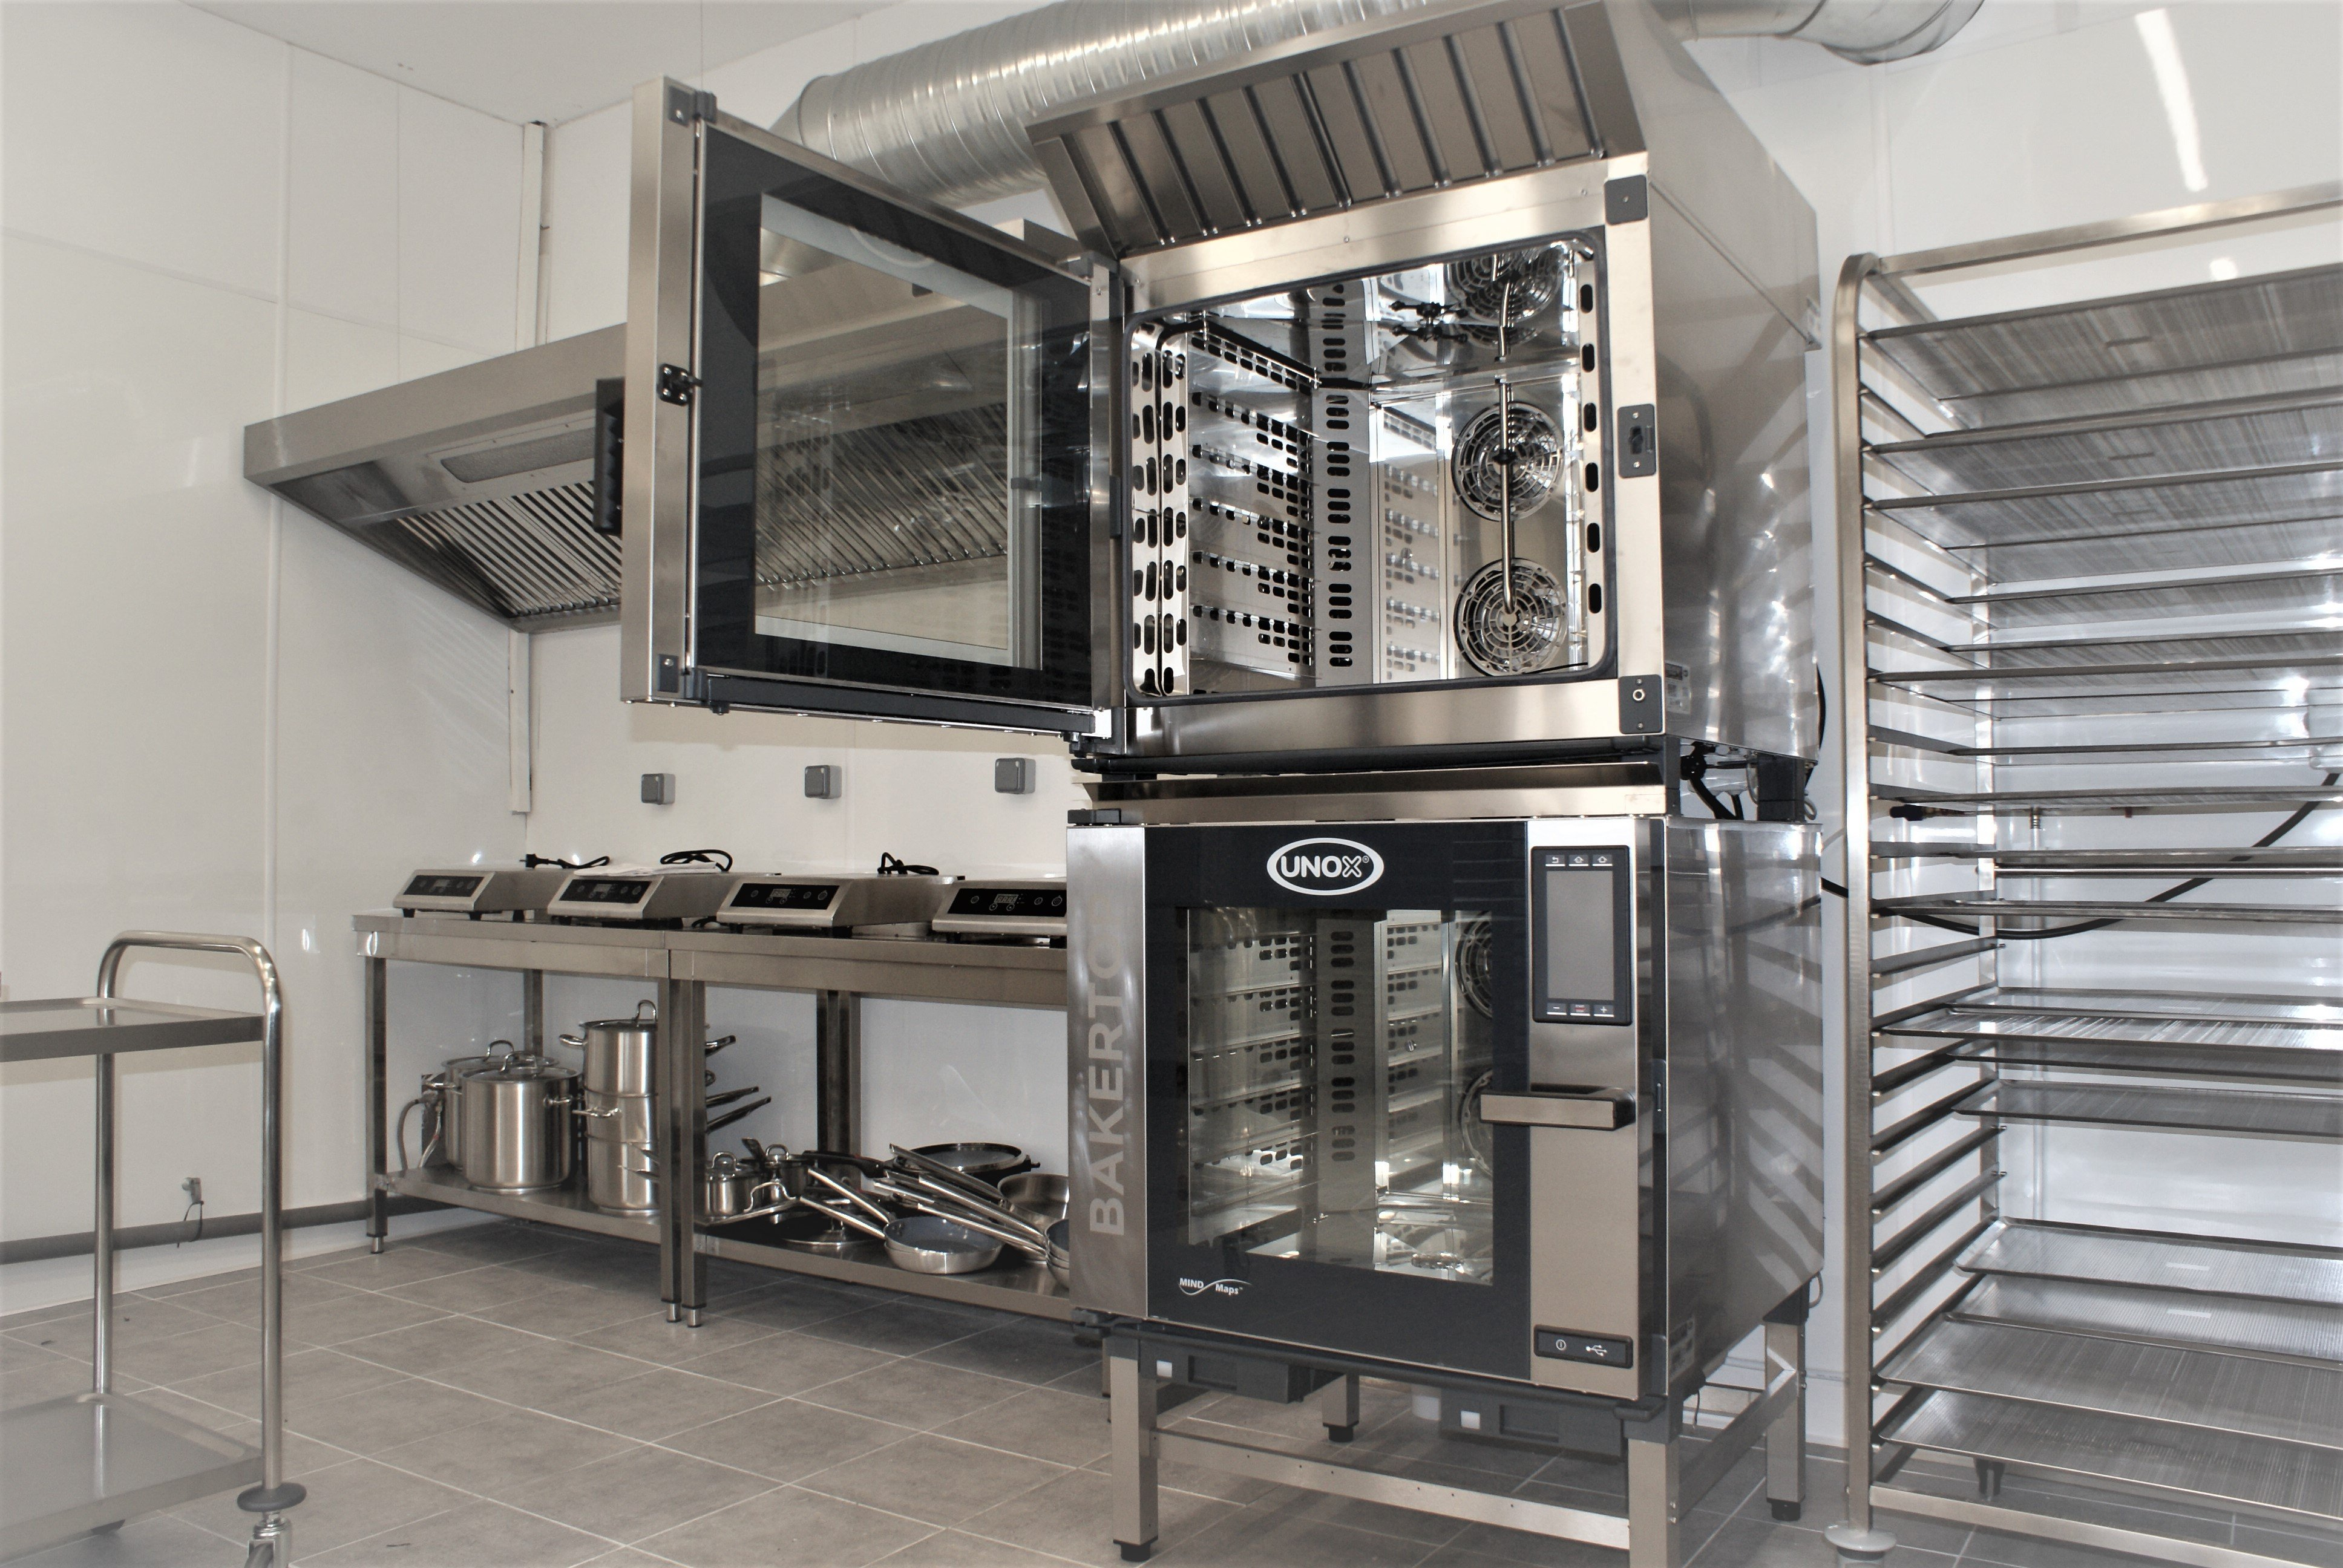 Cuisine Schmidt Marseille 13009 location cuisine professionnelle